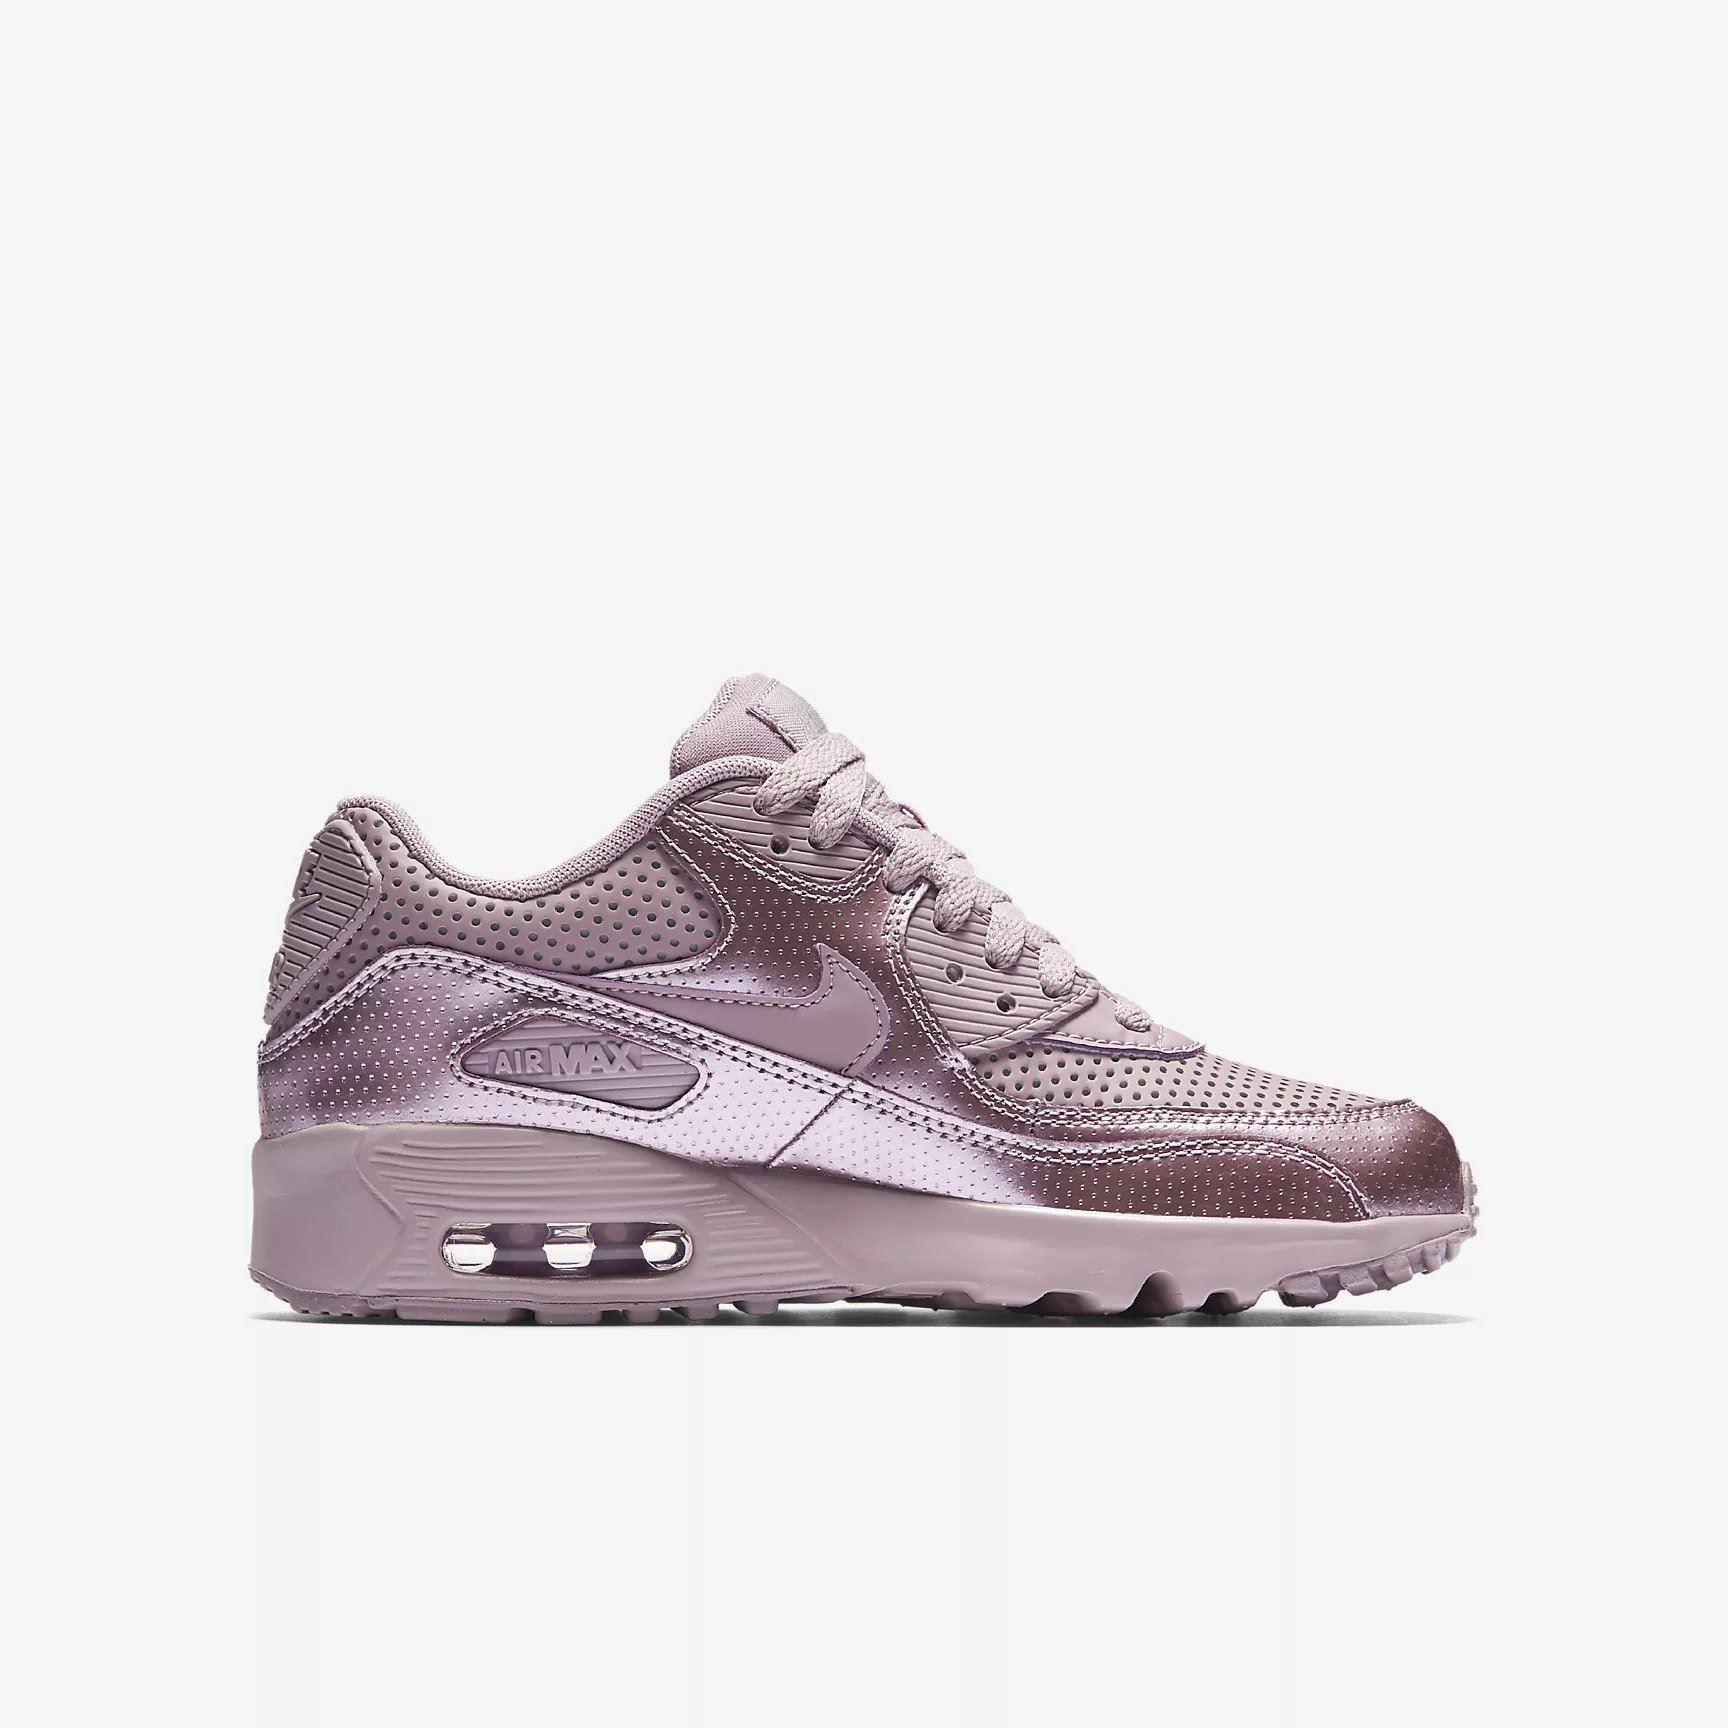 best sneakers d2ce3 fb784 Nike Air Max 90 SE LTR (GS) Elemental Rose 859633 600 Girls UK 3-5.5